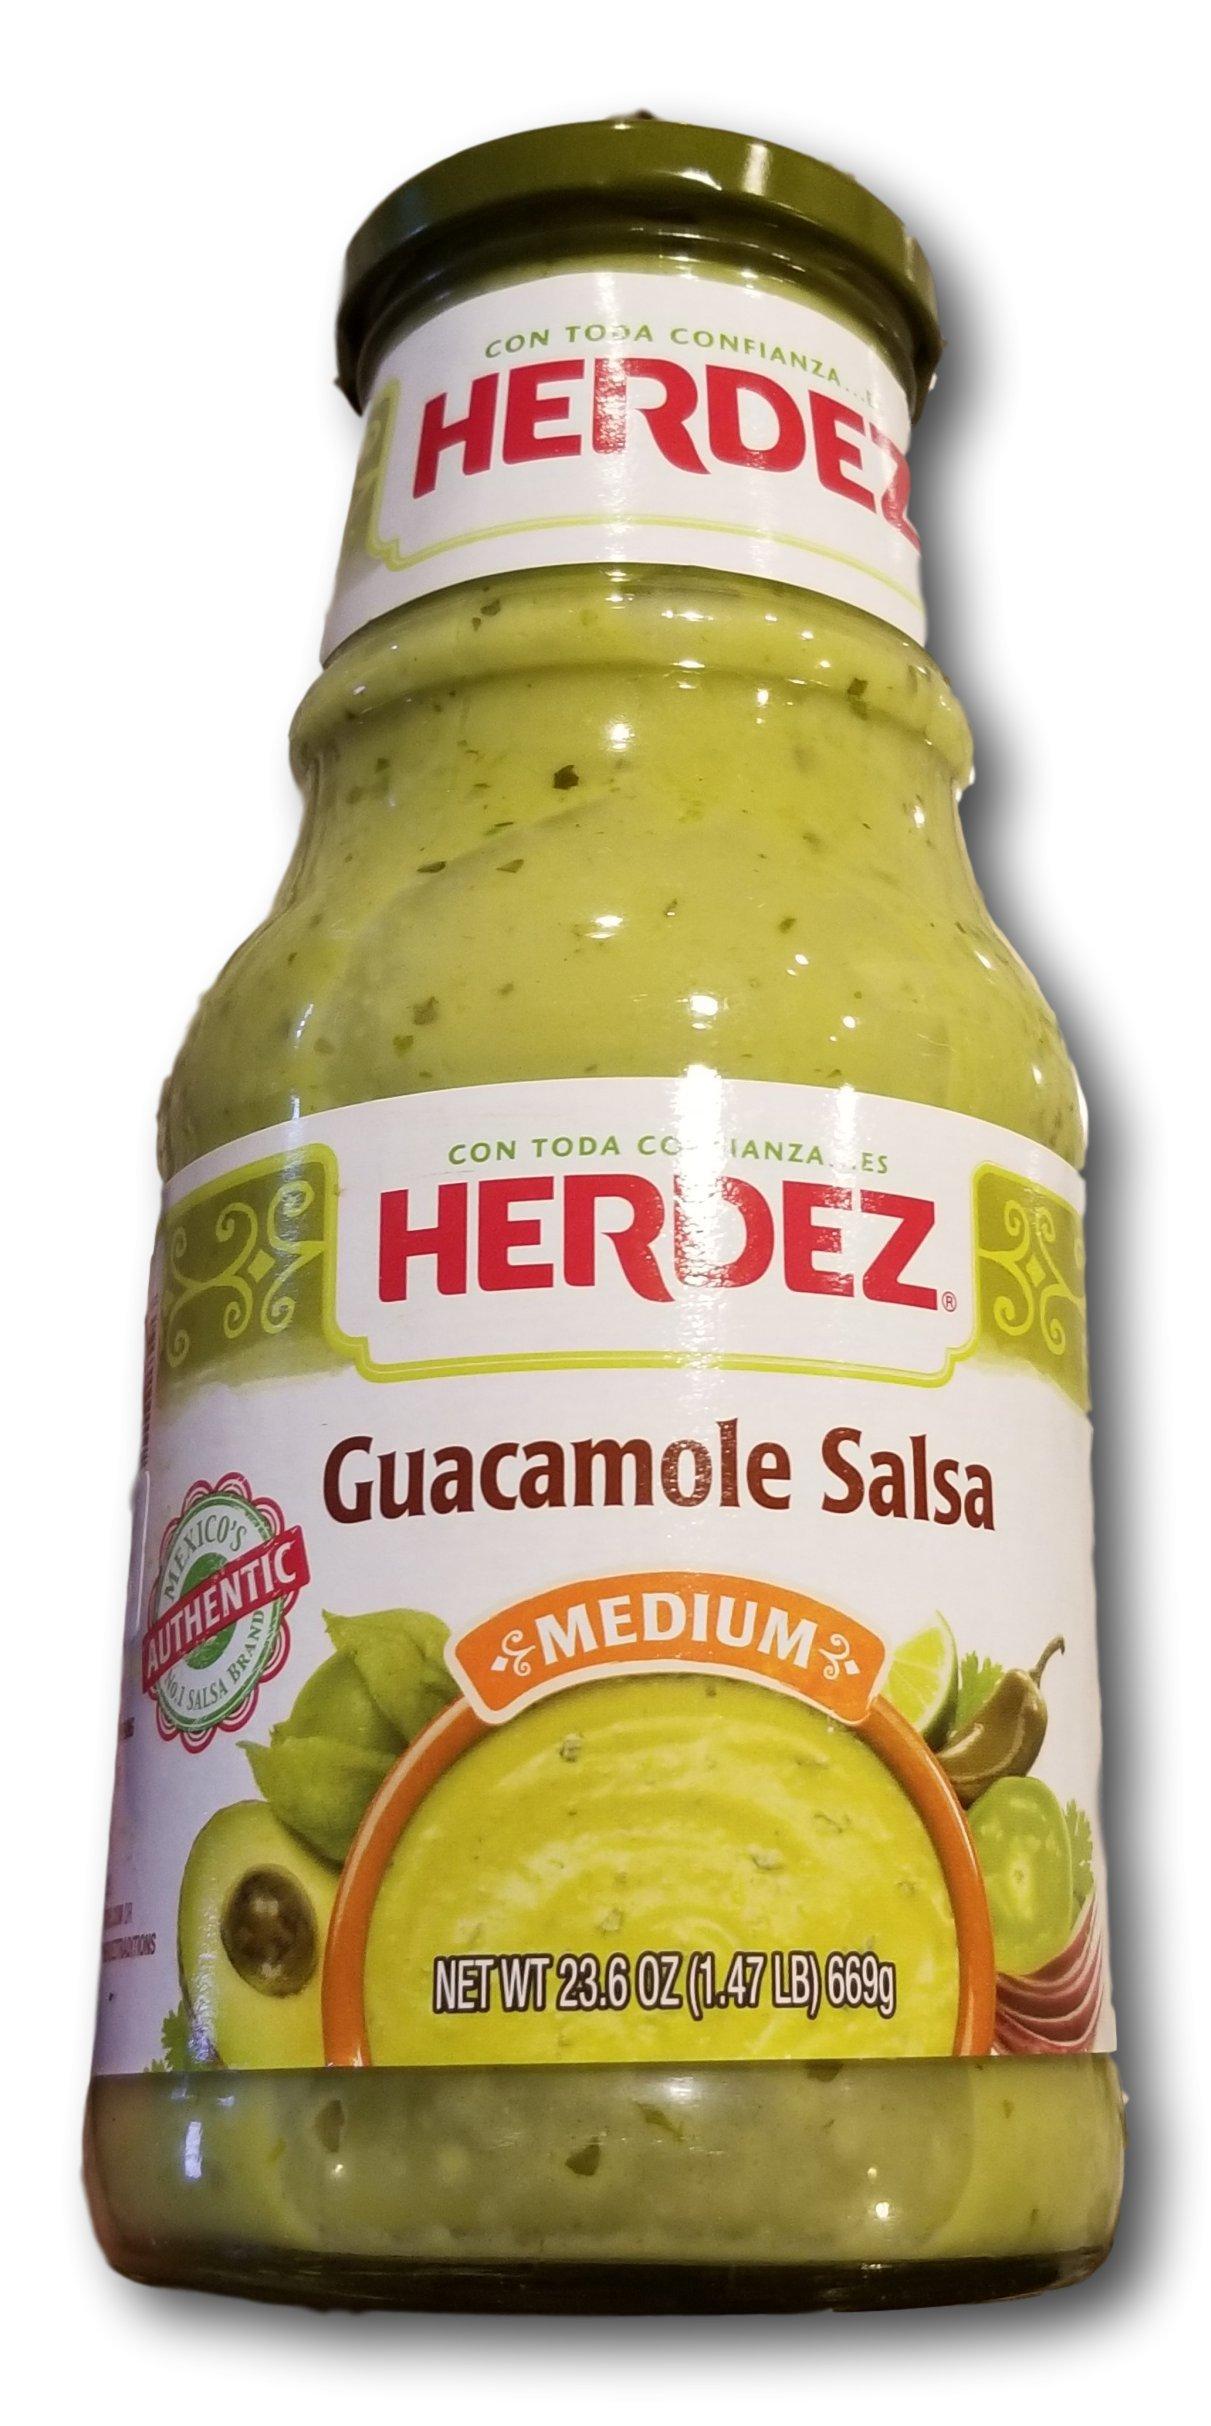 Herdez Guacamole Sales- Mild- 23.6oz by Herdez